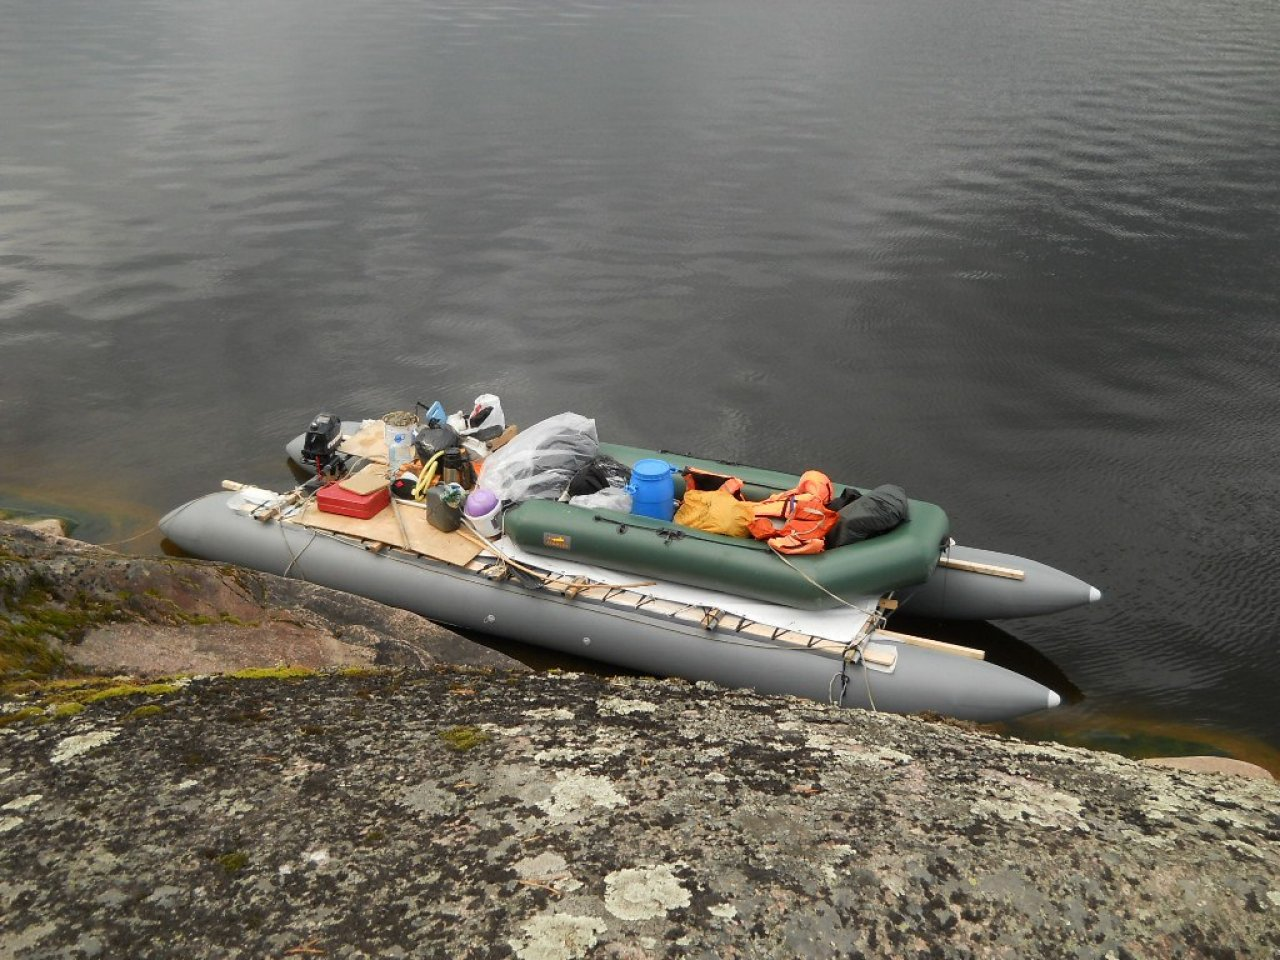 Катамаран «Баюн», на котором проходят экспедиции по Ладоге. Фото: Александр Кольский